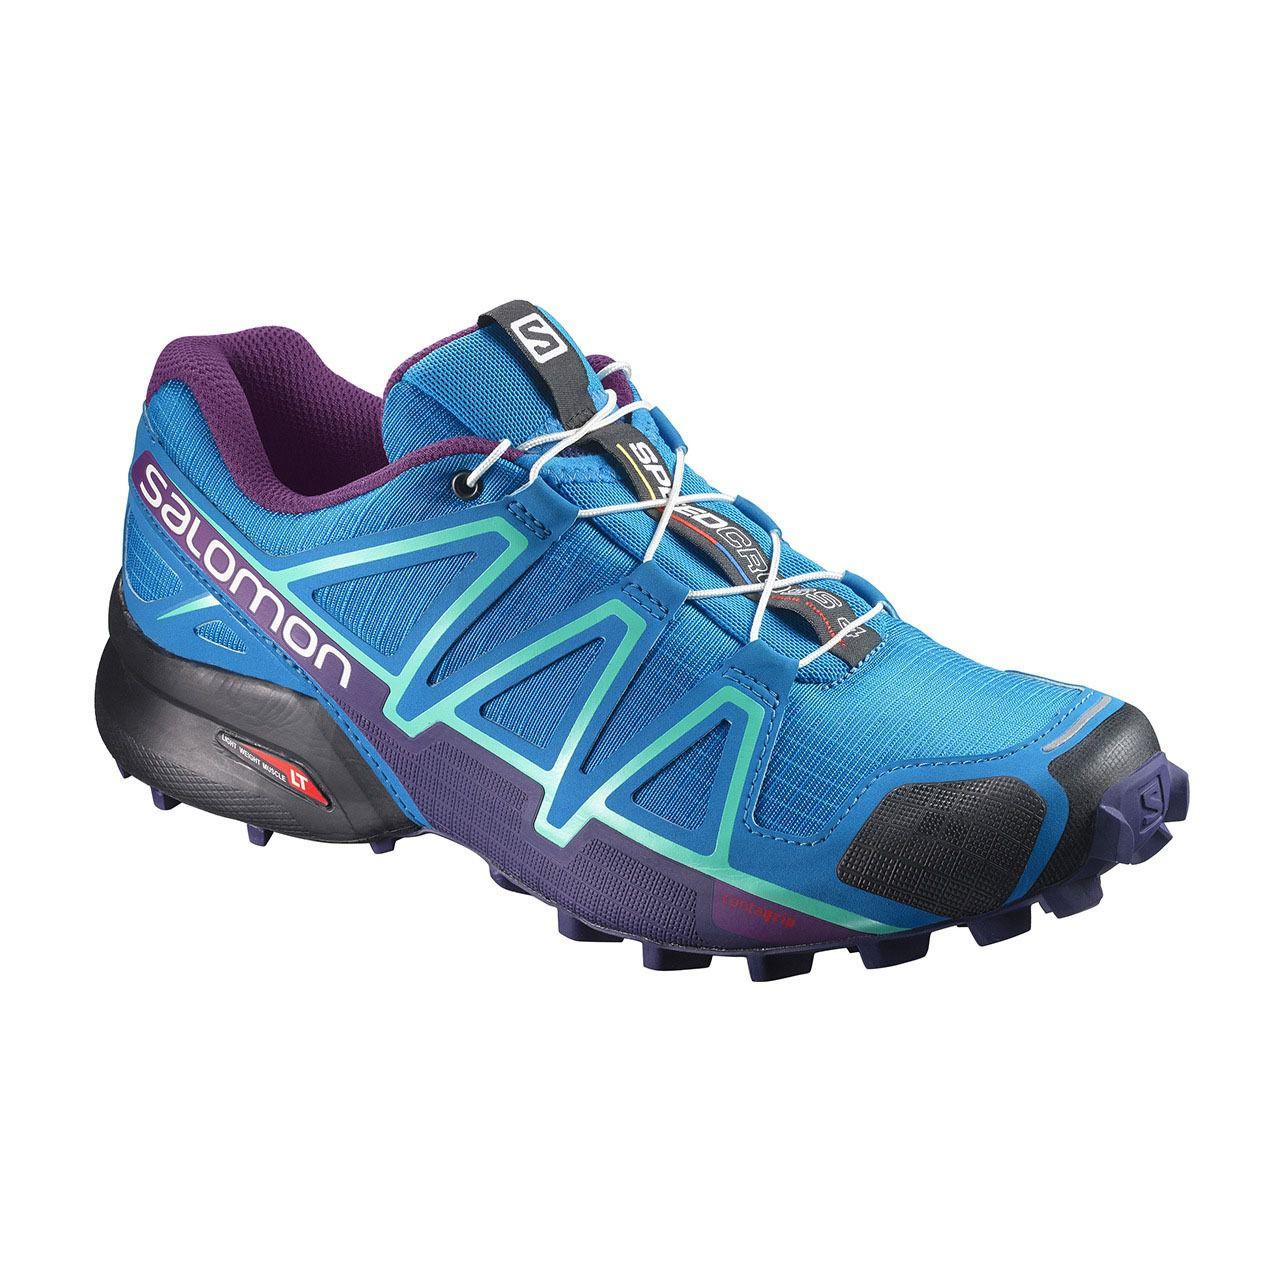 Tênis Salomon Speedcross 4 Fem - Azul /Roxo